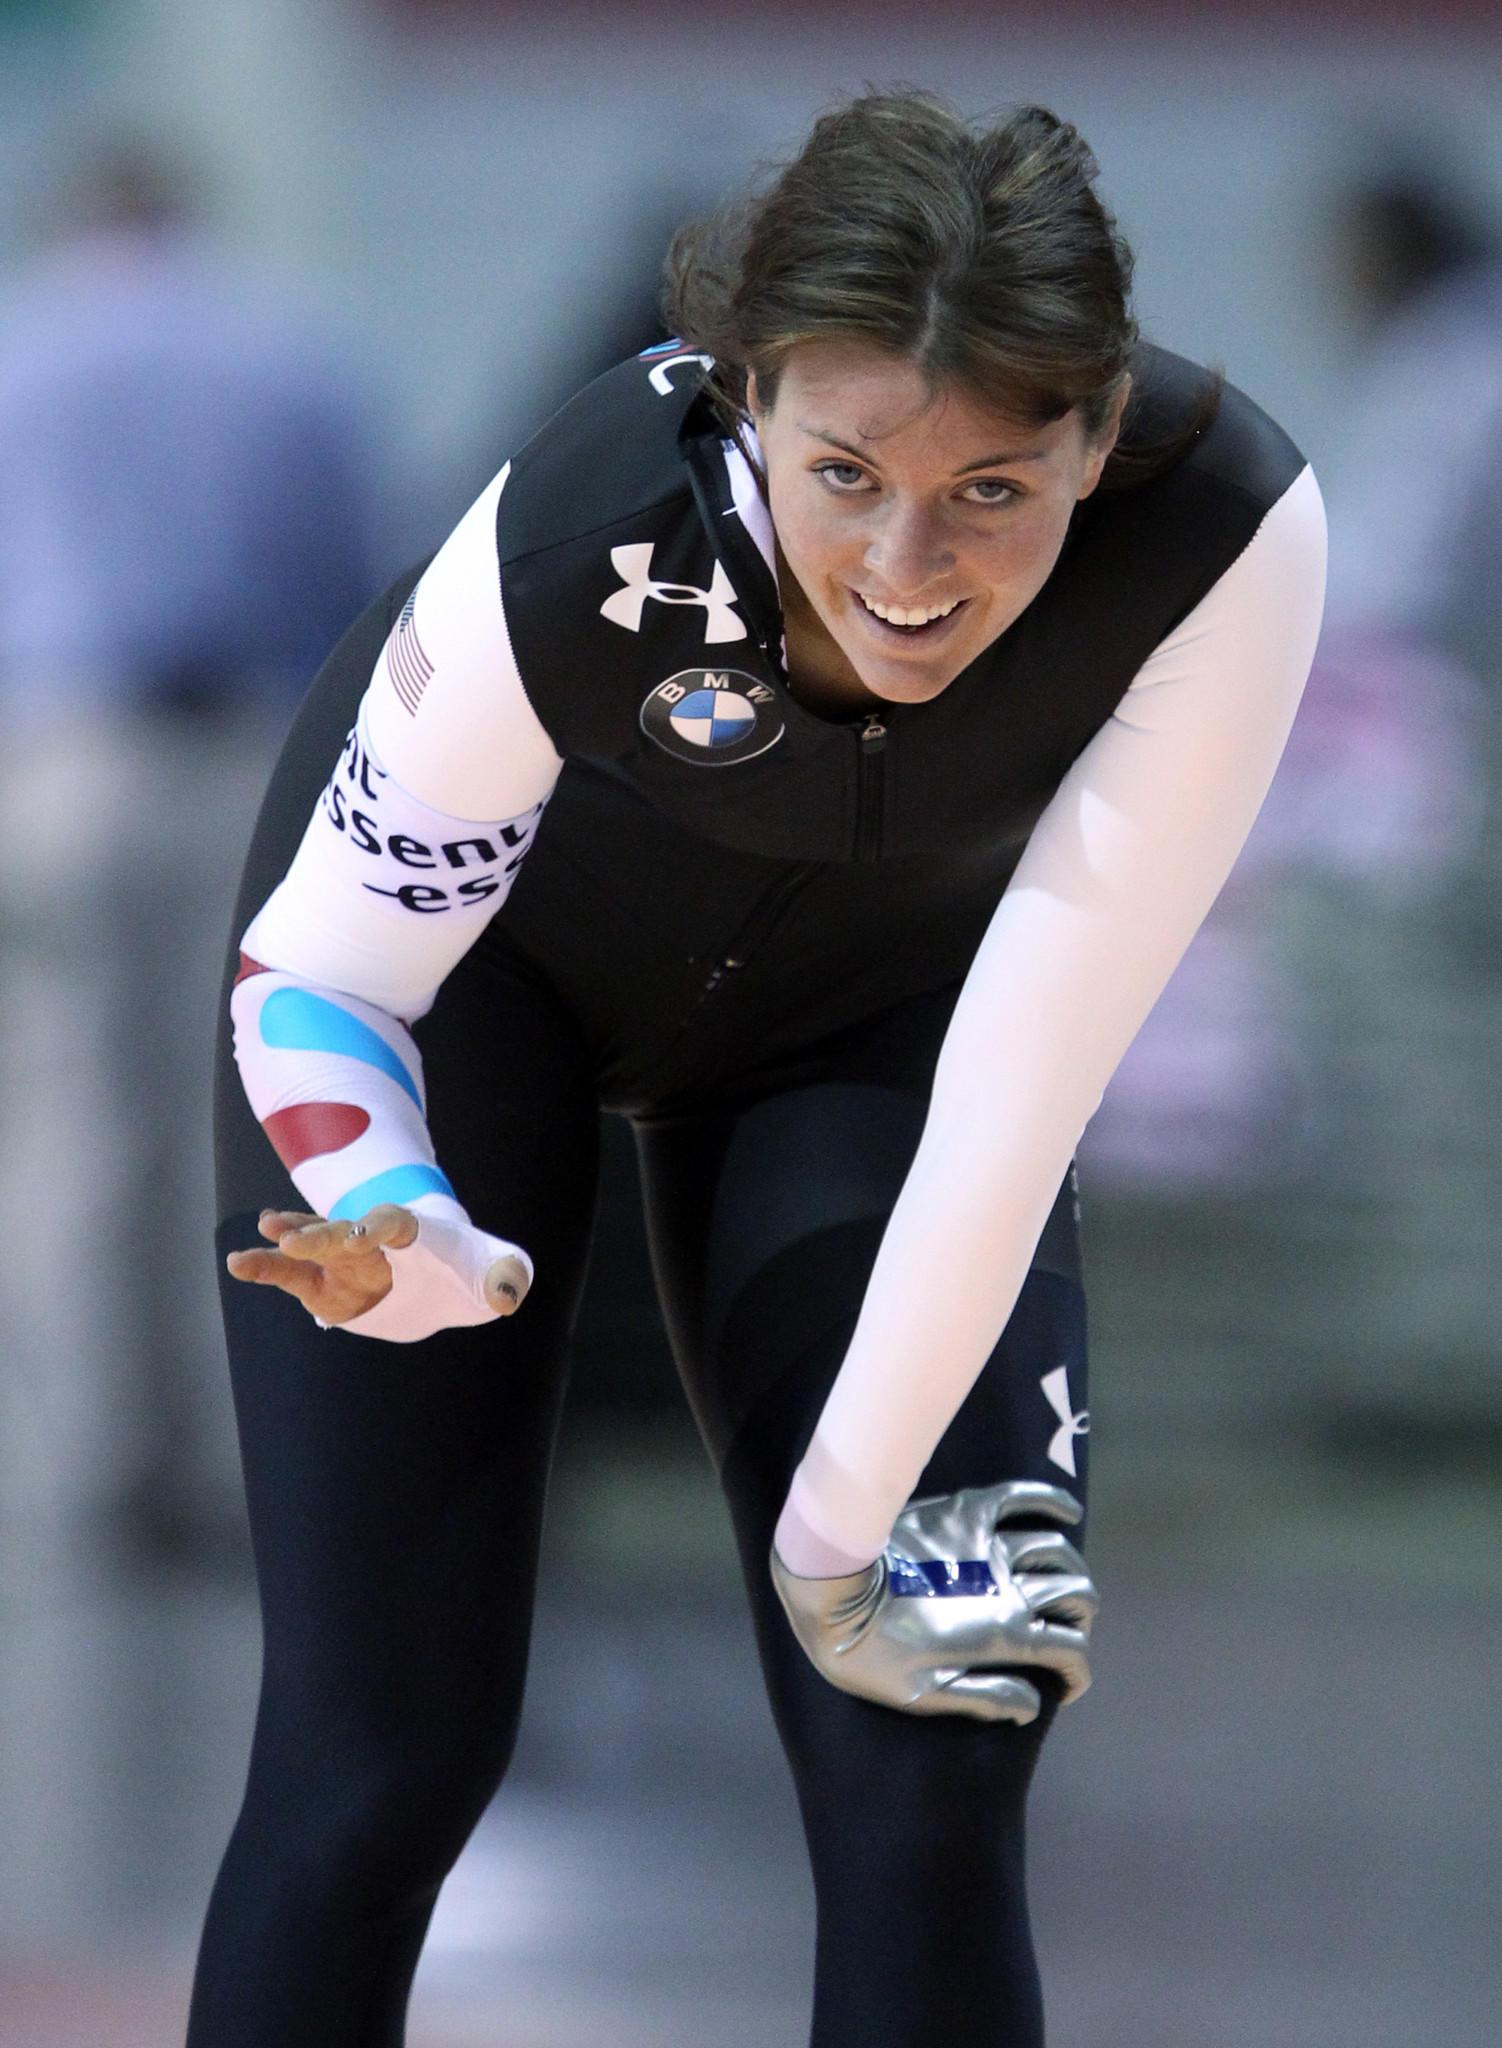 Heather Richardson smiles after completing her event. (John J. Kim/Tribune Photo)